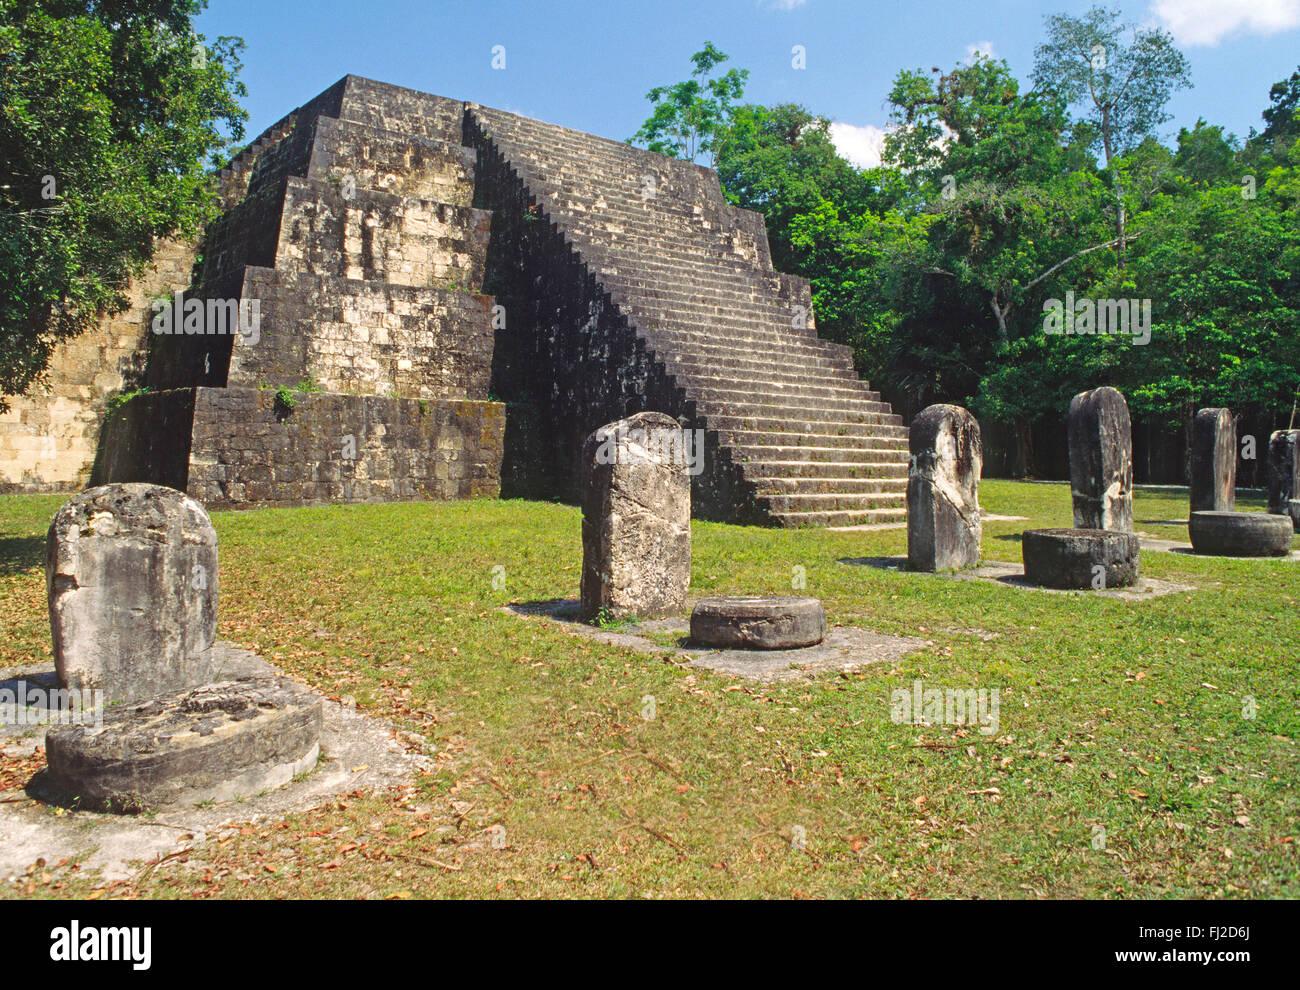 MAYA RUINS and stairway with STELAE & ALTERS to MAYA RULERS of TIKAL - PETEN JUNGLE, GUATEMALA - Stock Image